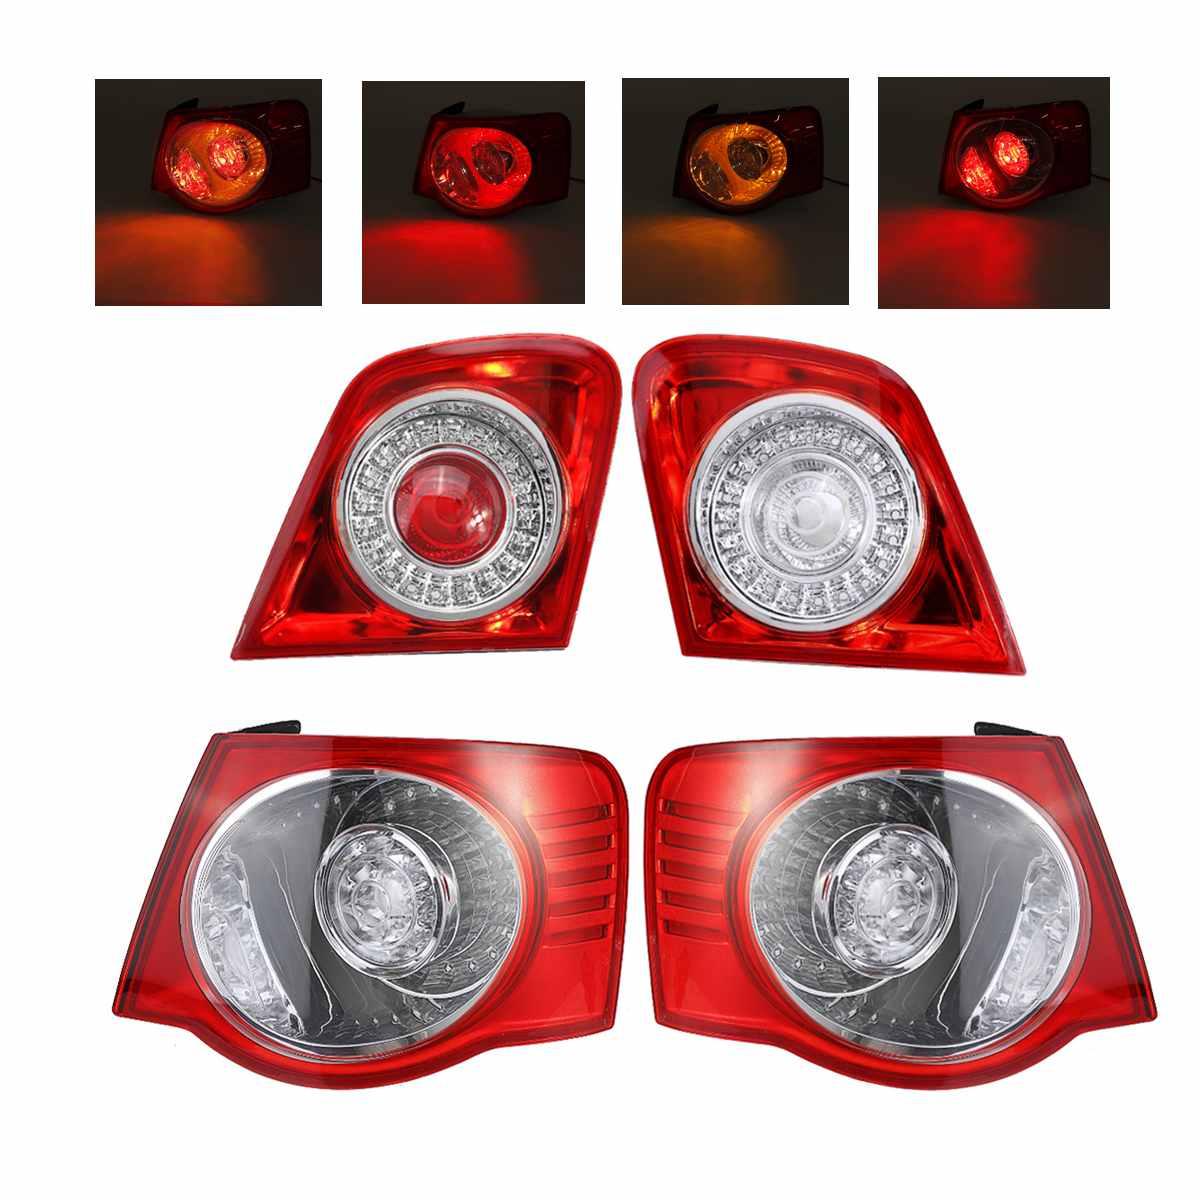 New Car Tail Light Shell Taillight Rear DRL Brake Light Signal Lamp For VW Passat B6 Sendan 2006 2007 2008 2009 2010 2011